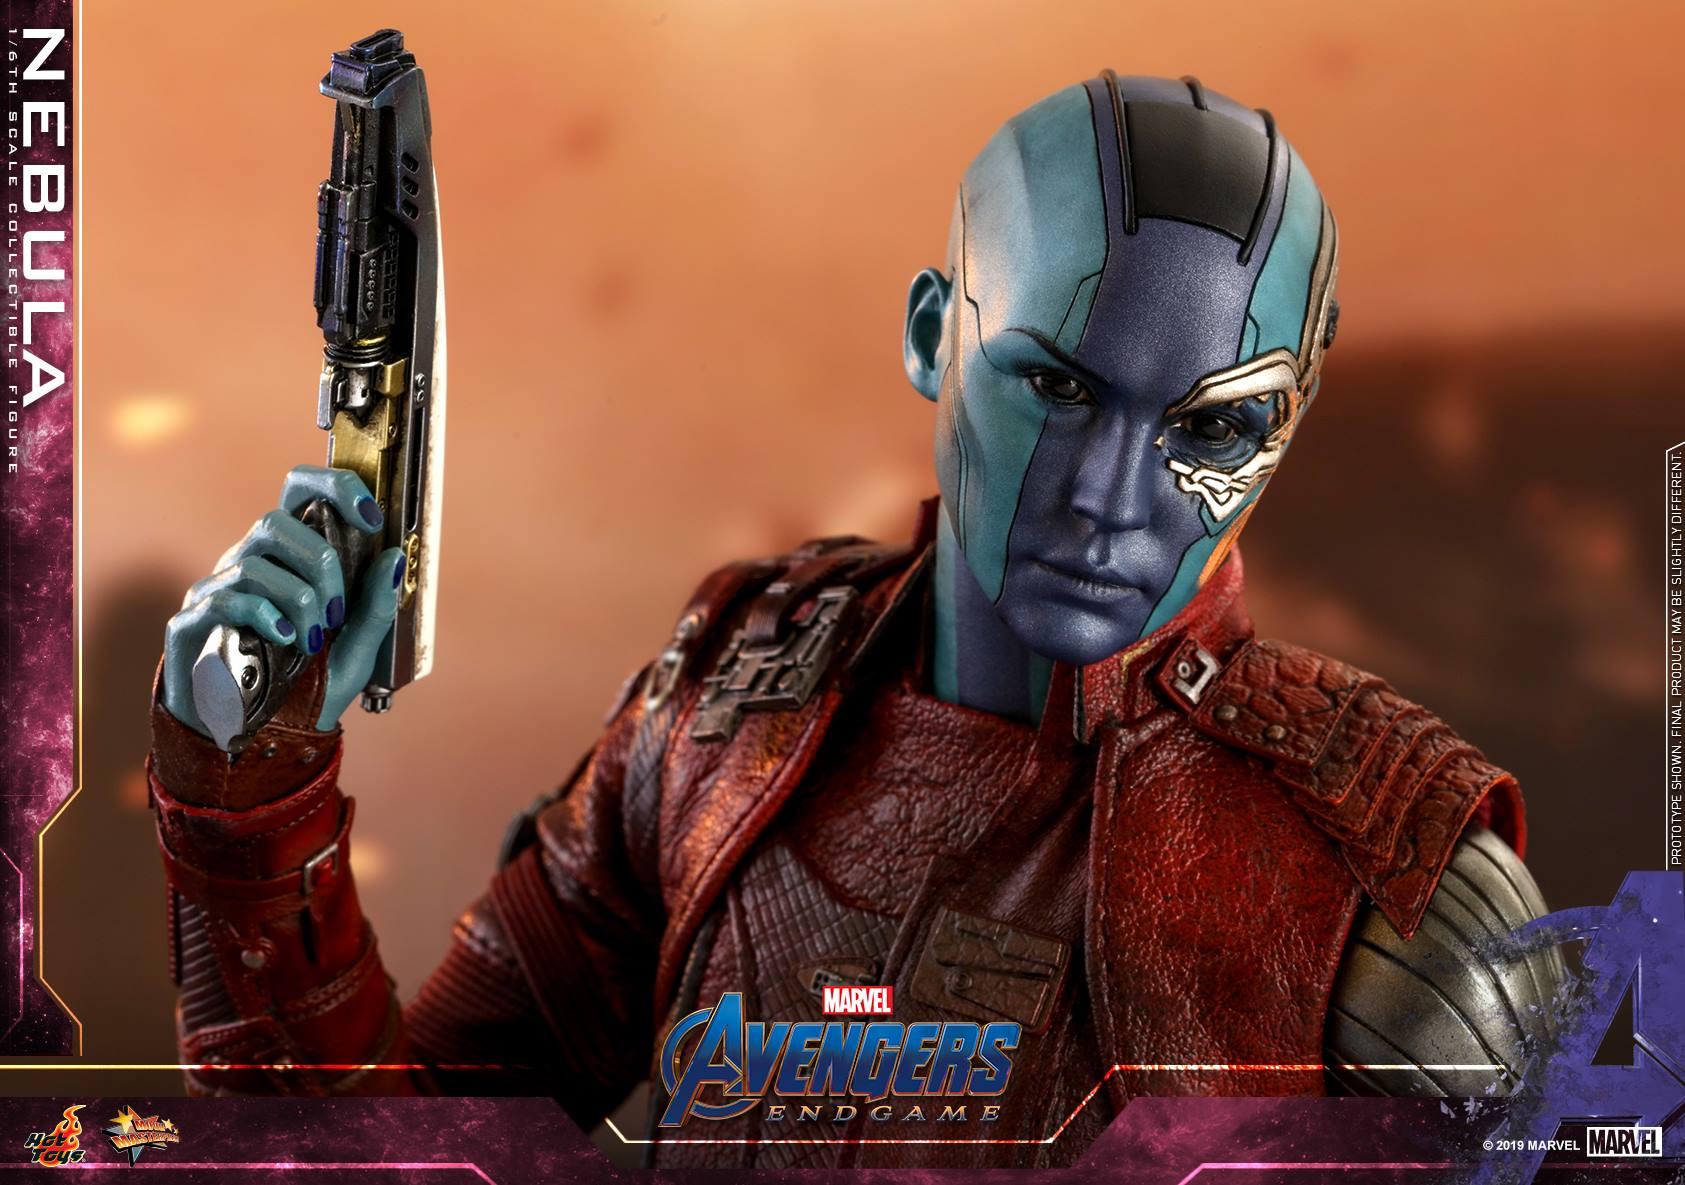 Nebula Endgame Hot Toys 1//6 MMS534 Avengers